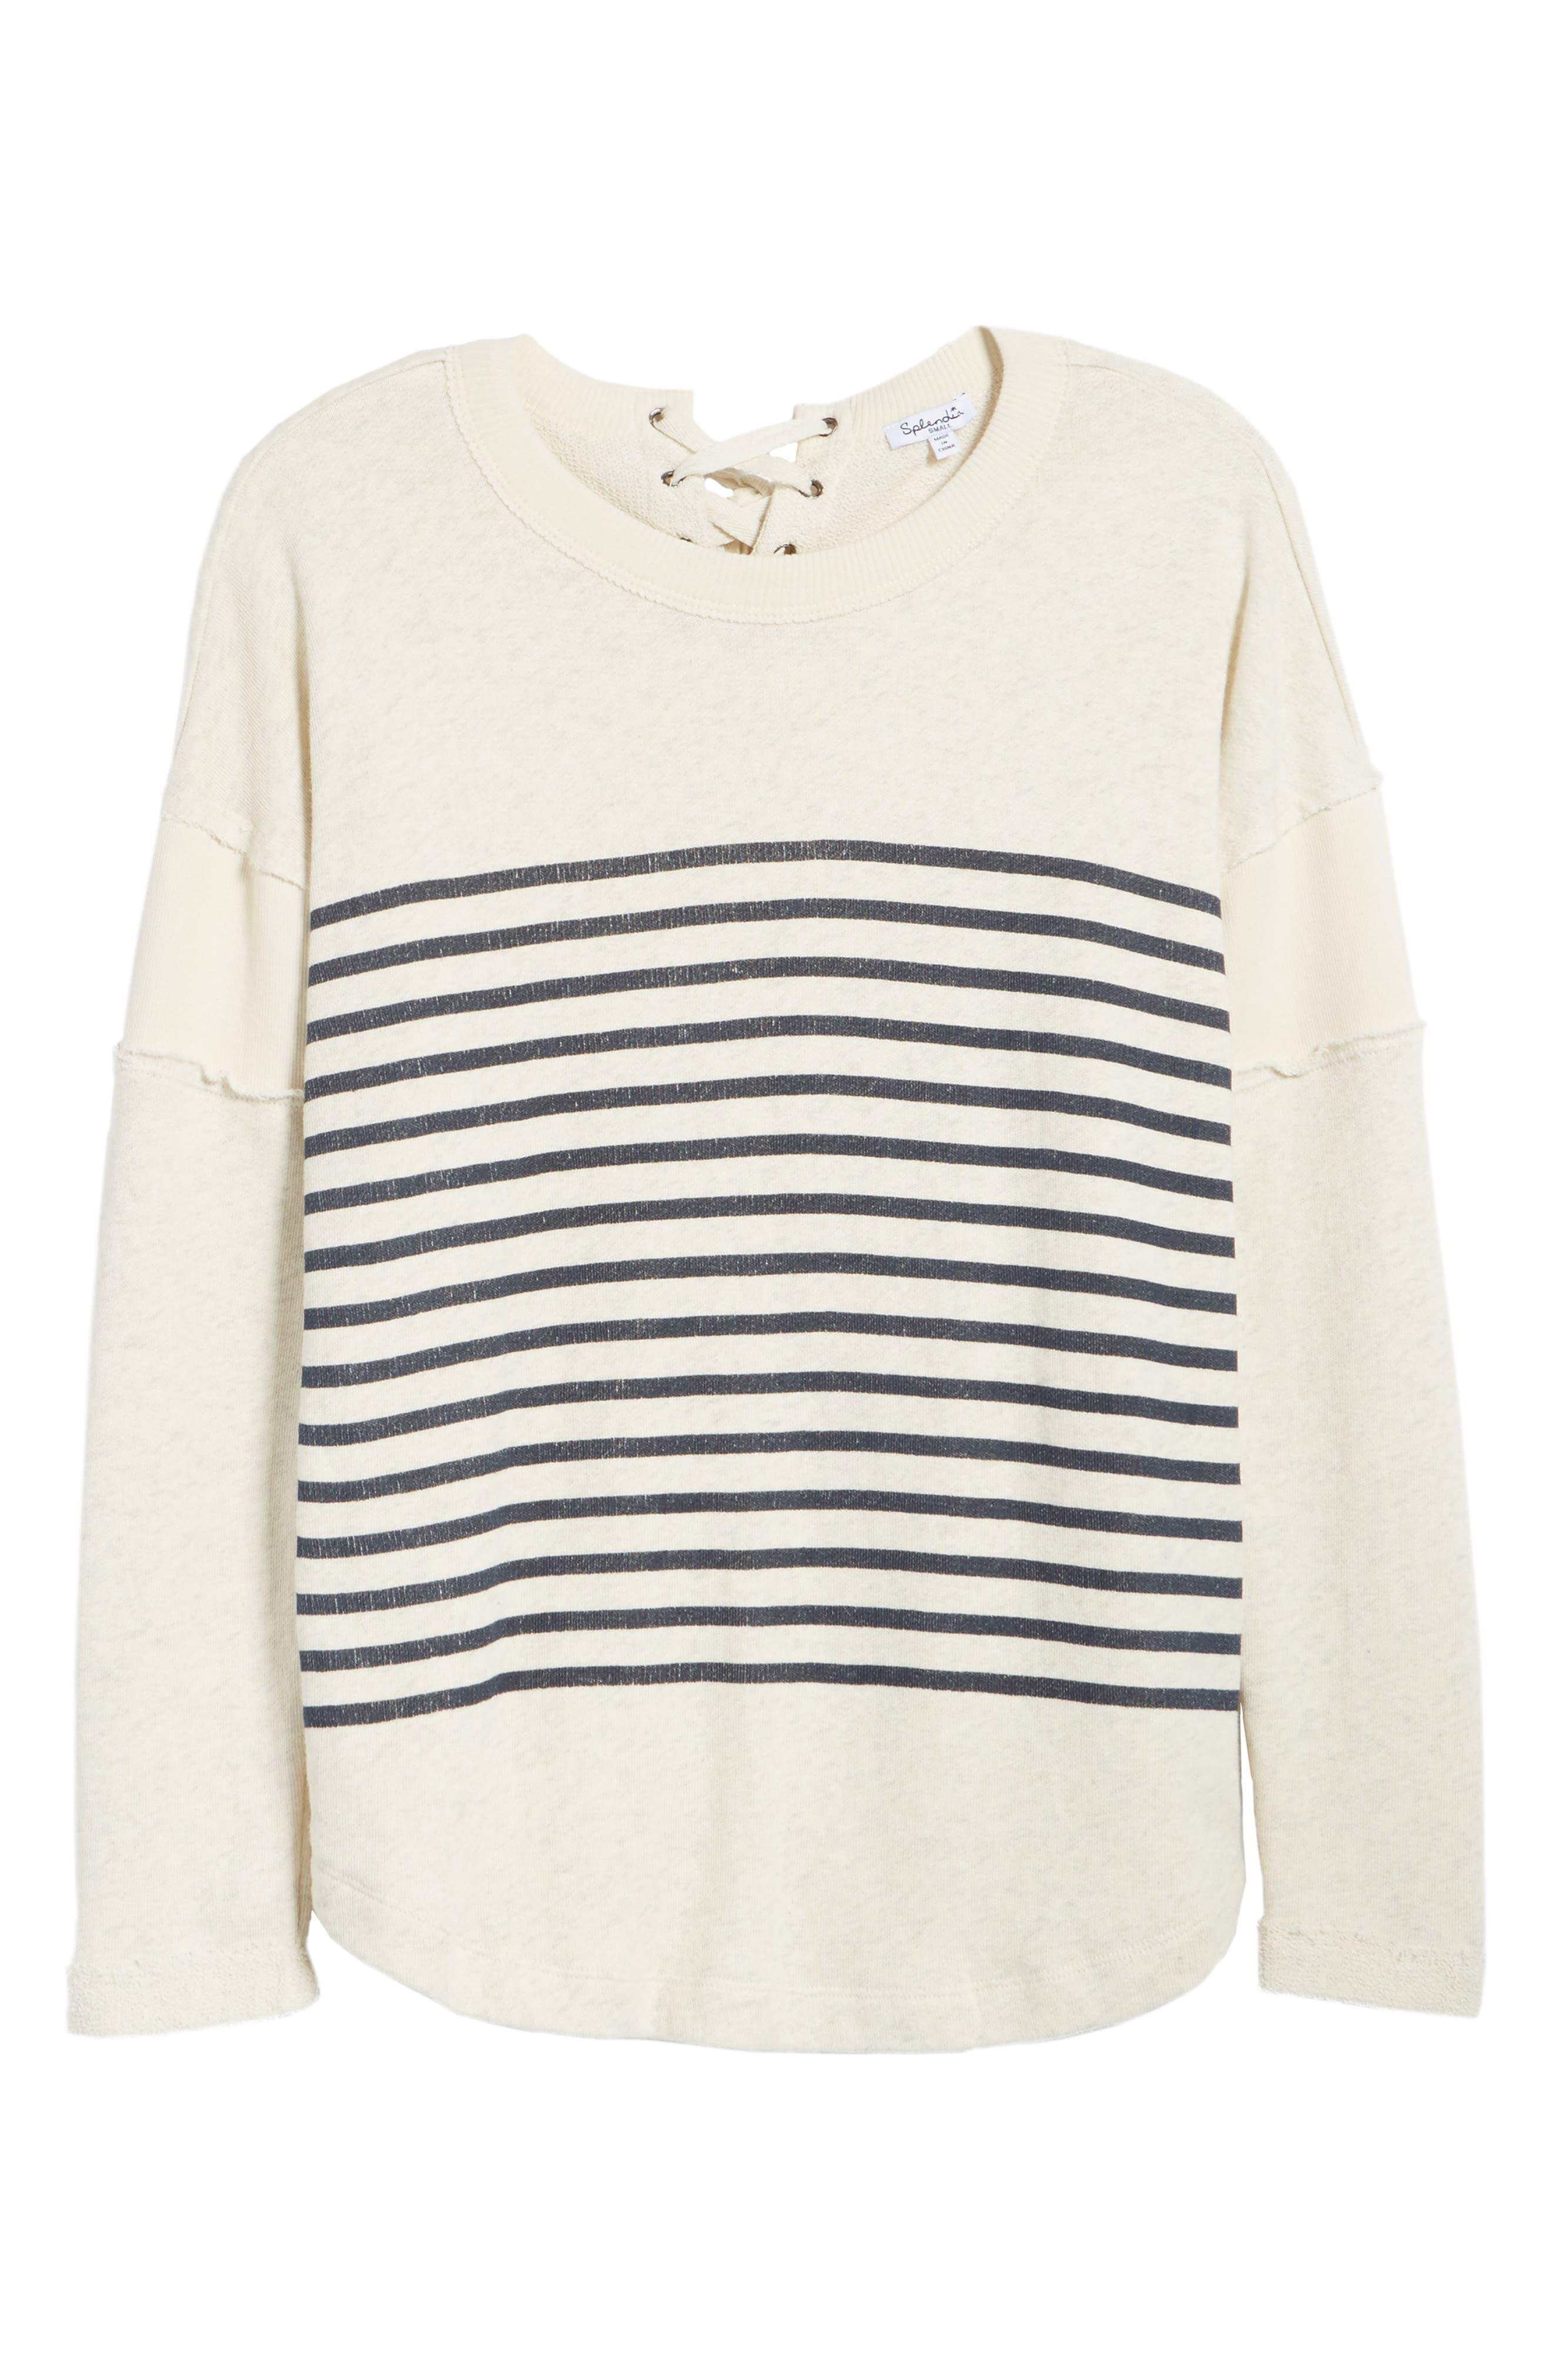 Seabrook Stripe Sweatshirt,                             Alternate thumbnail 6, color,                             909